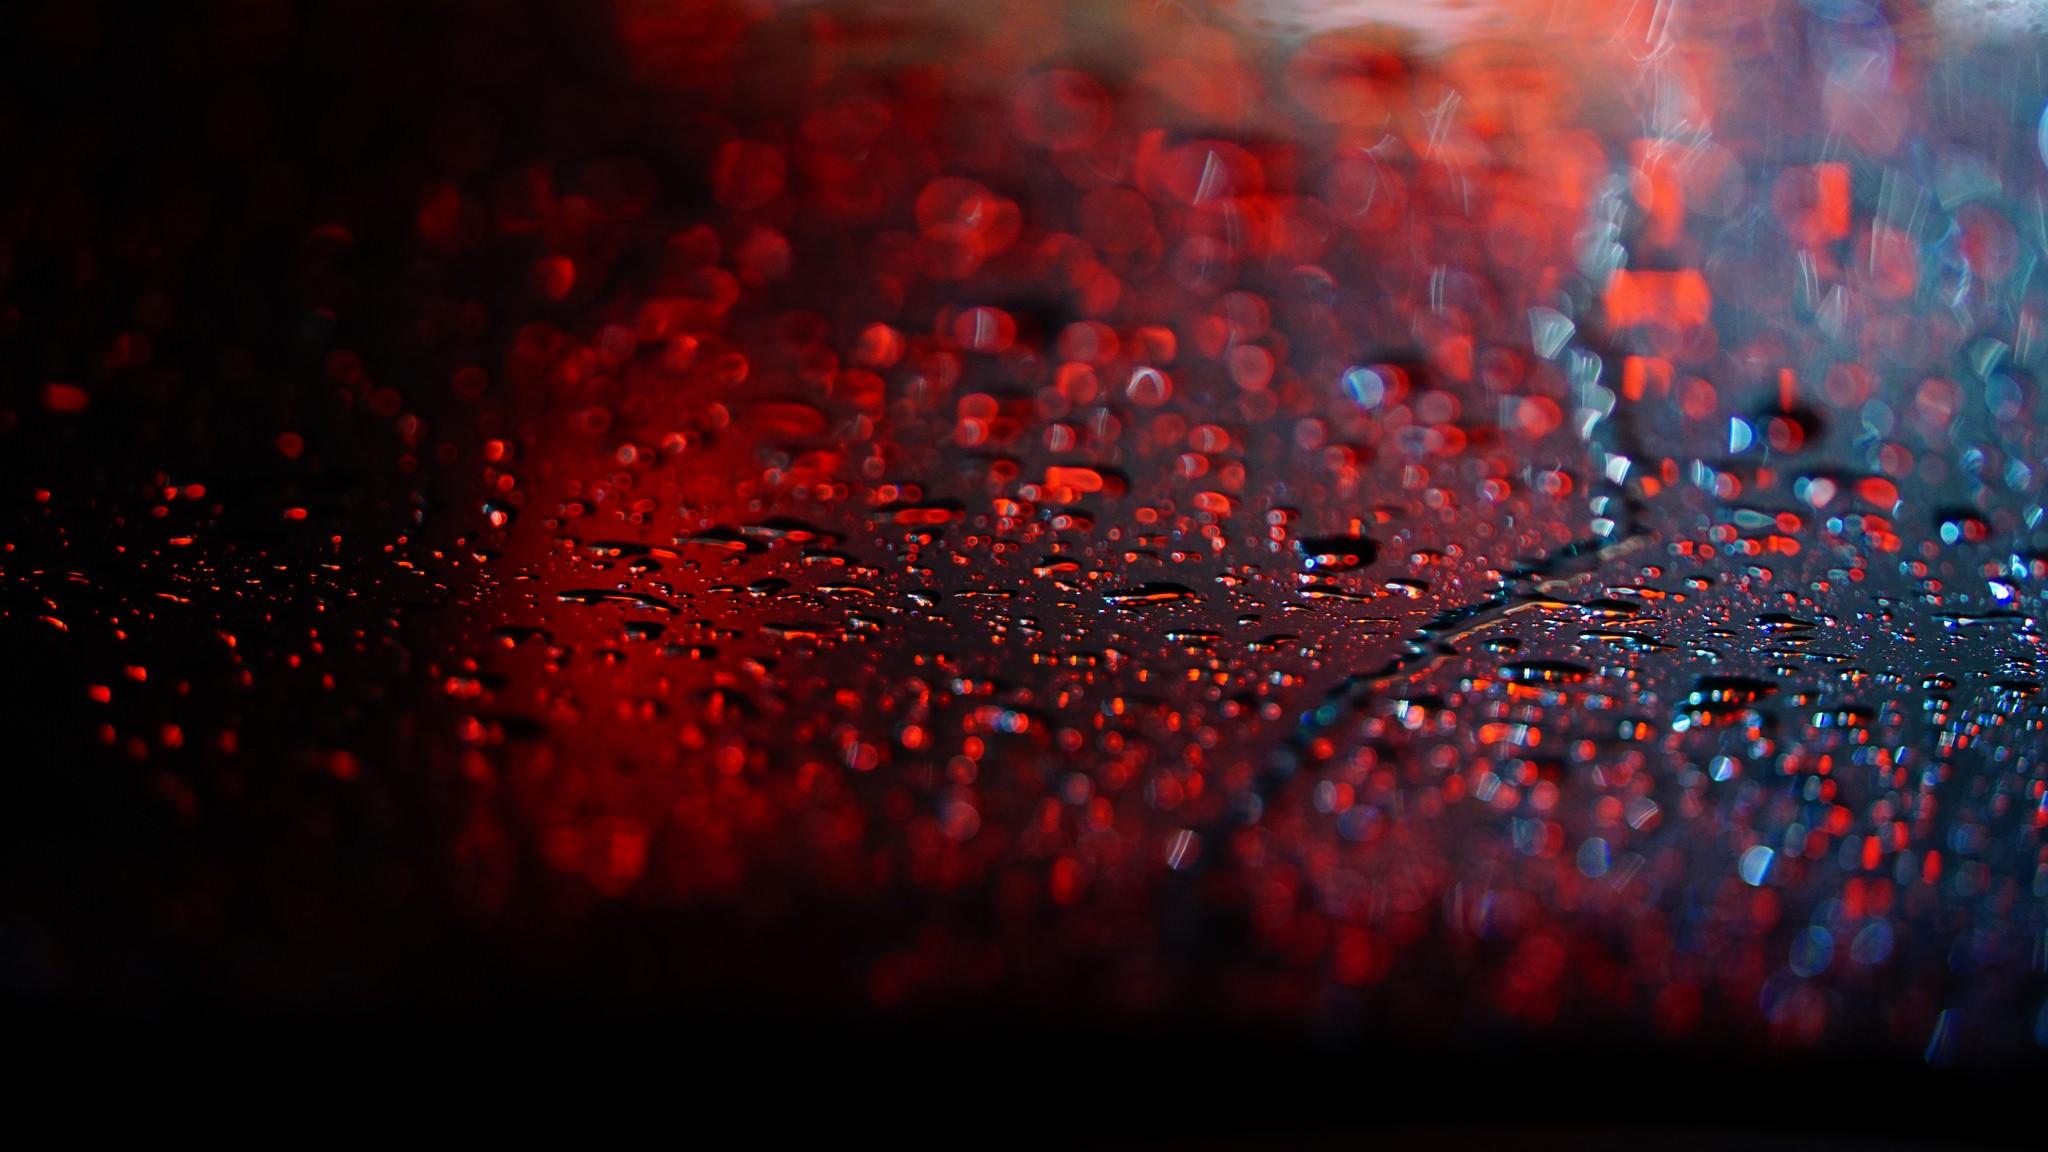 перепелок составление картинки дождя для ютуба тому